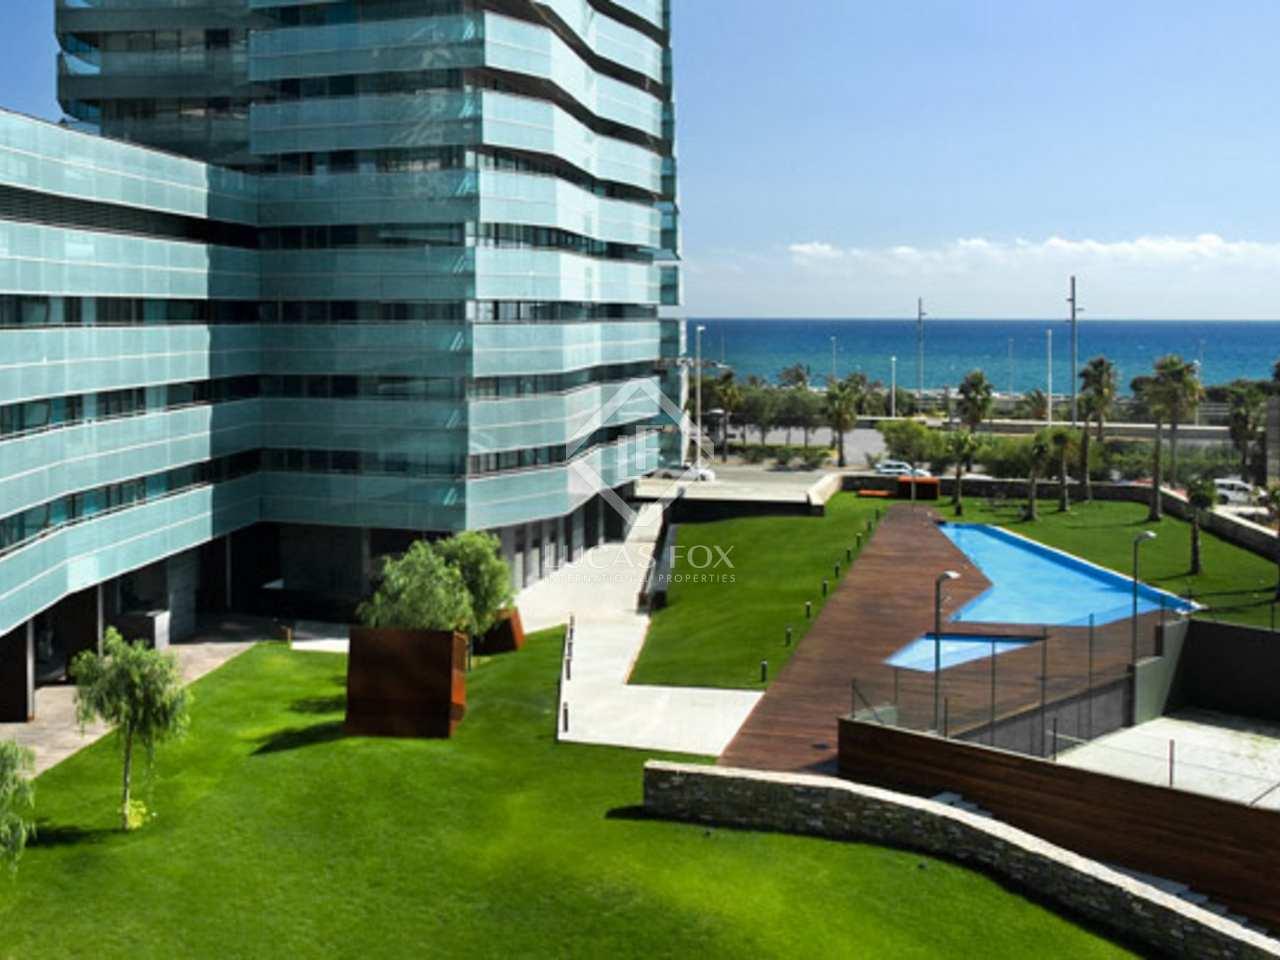 Appartement de luxe en vente diagonal mar barcelone - Acheter appartement a barcelone ...